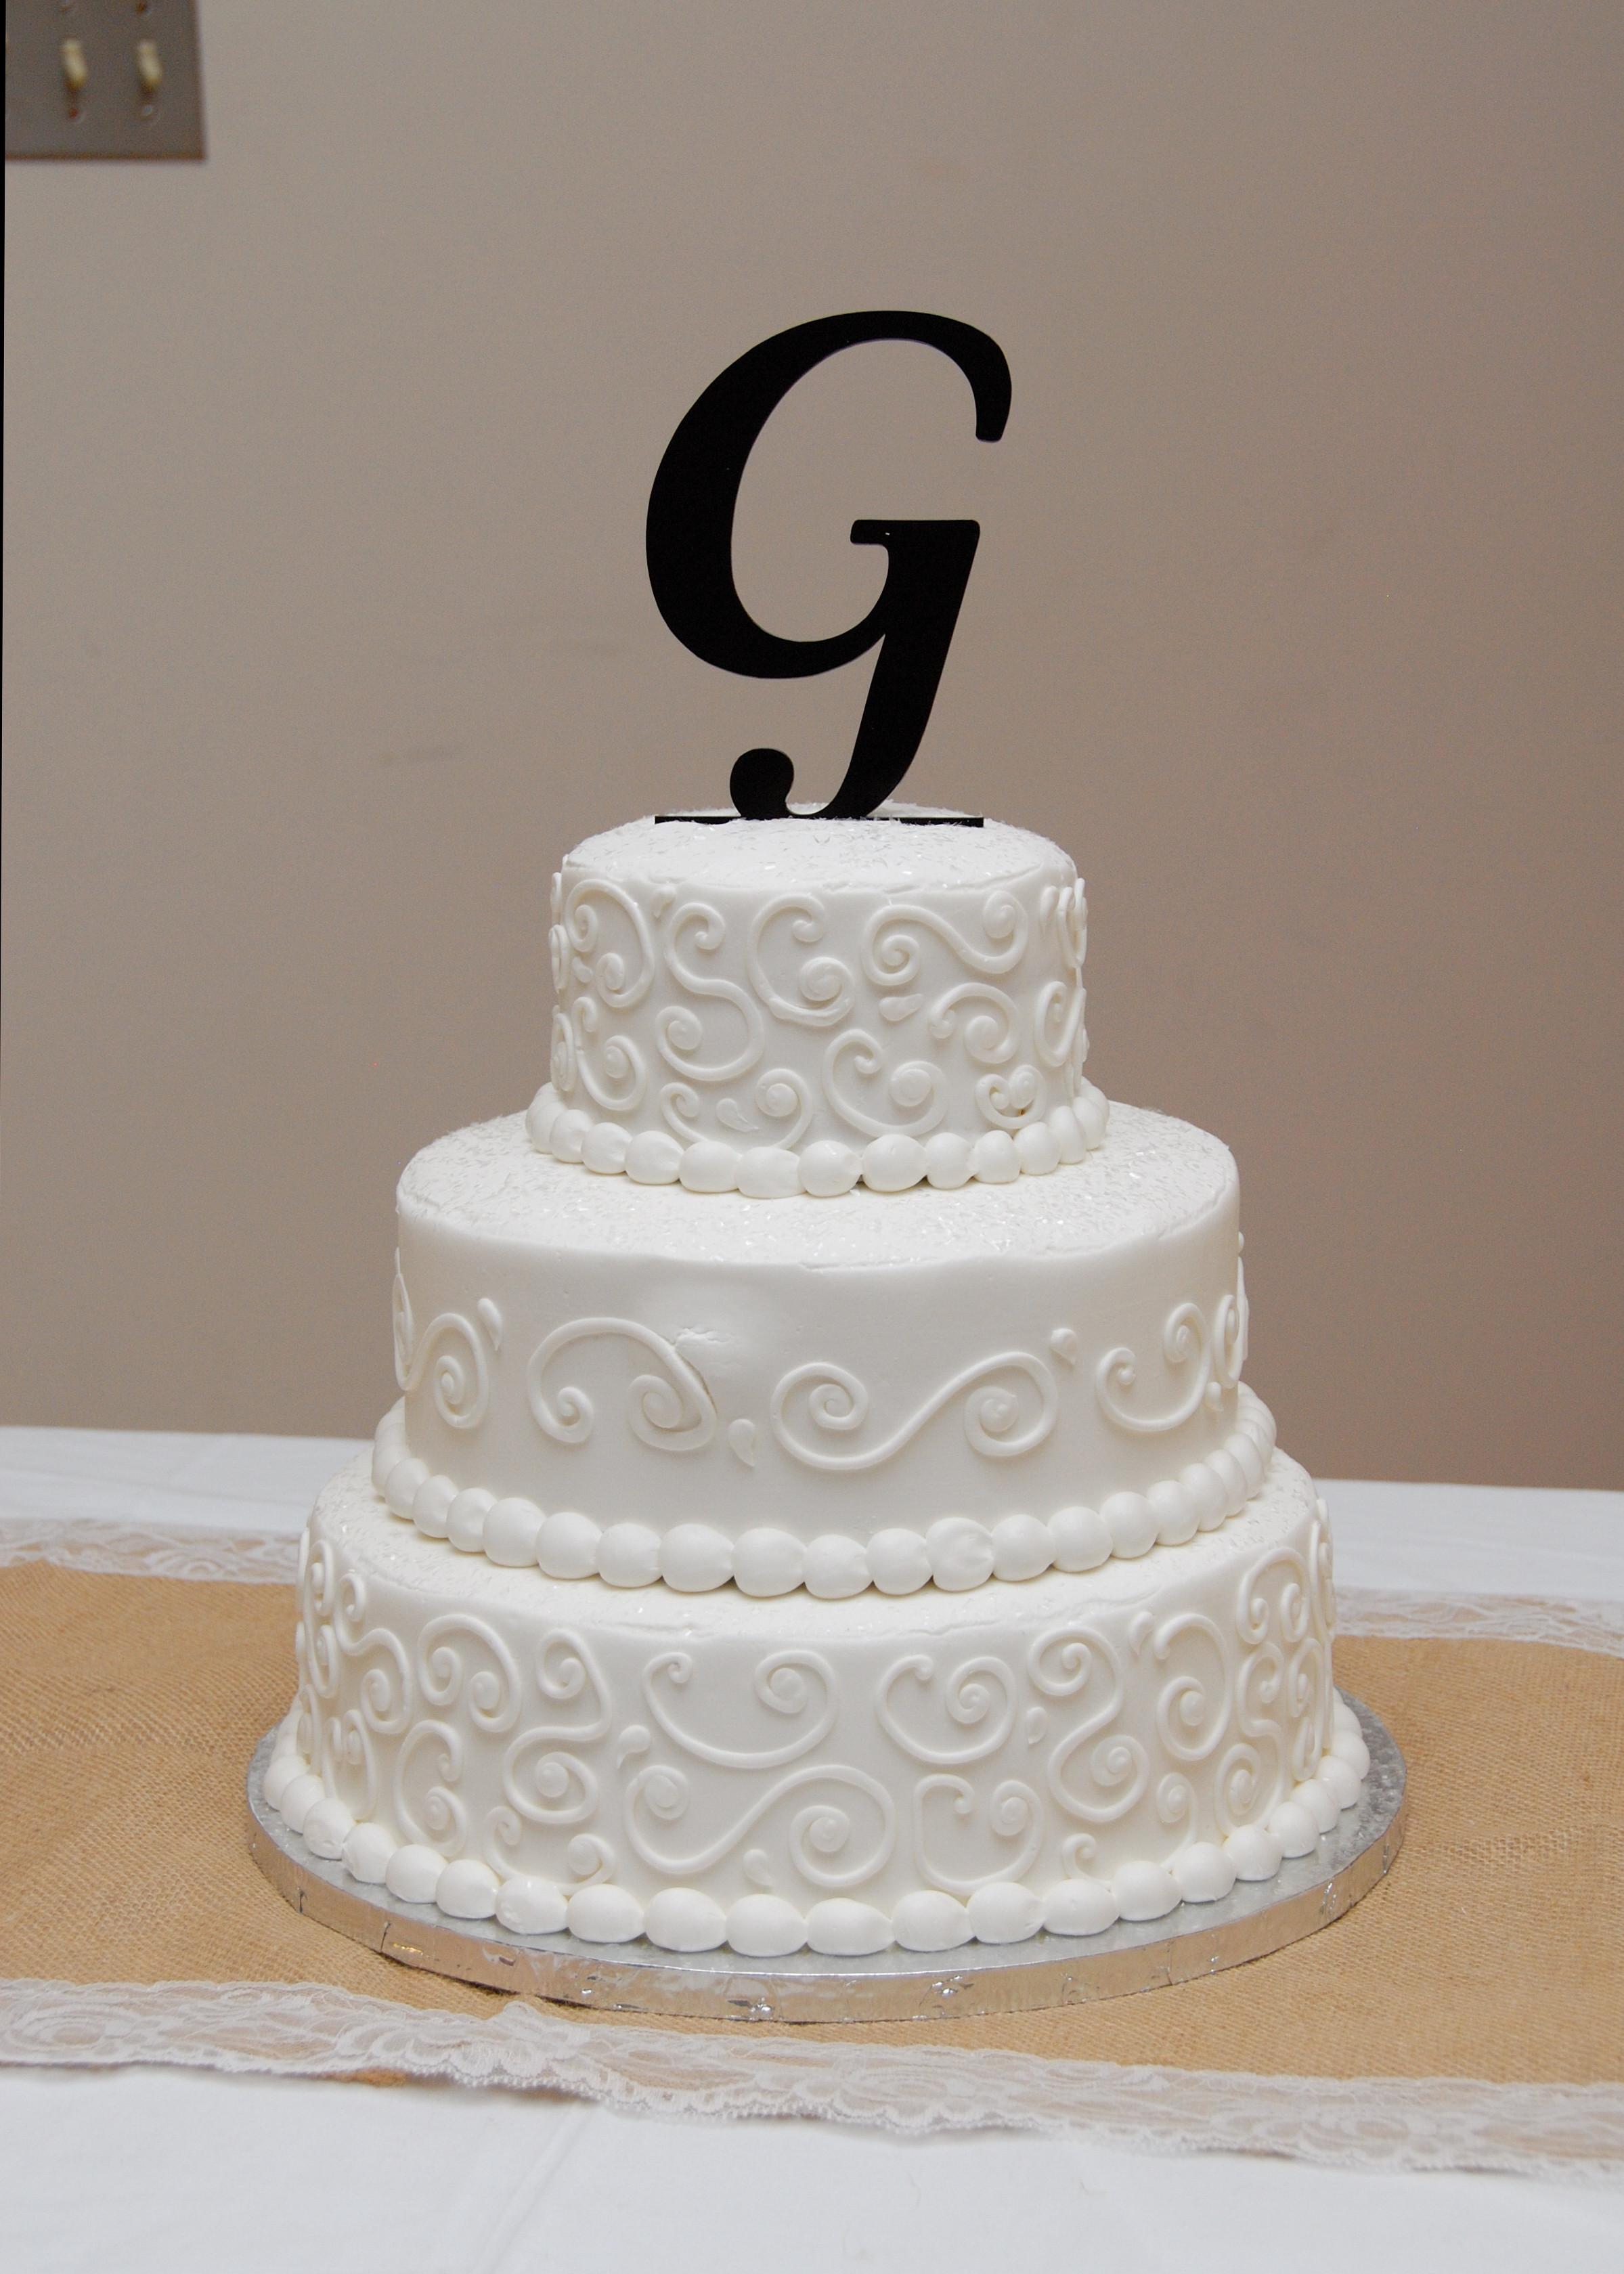 Walmart Wedding Cakes Price List  Walmart Wedding Cake Prices